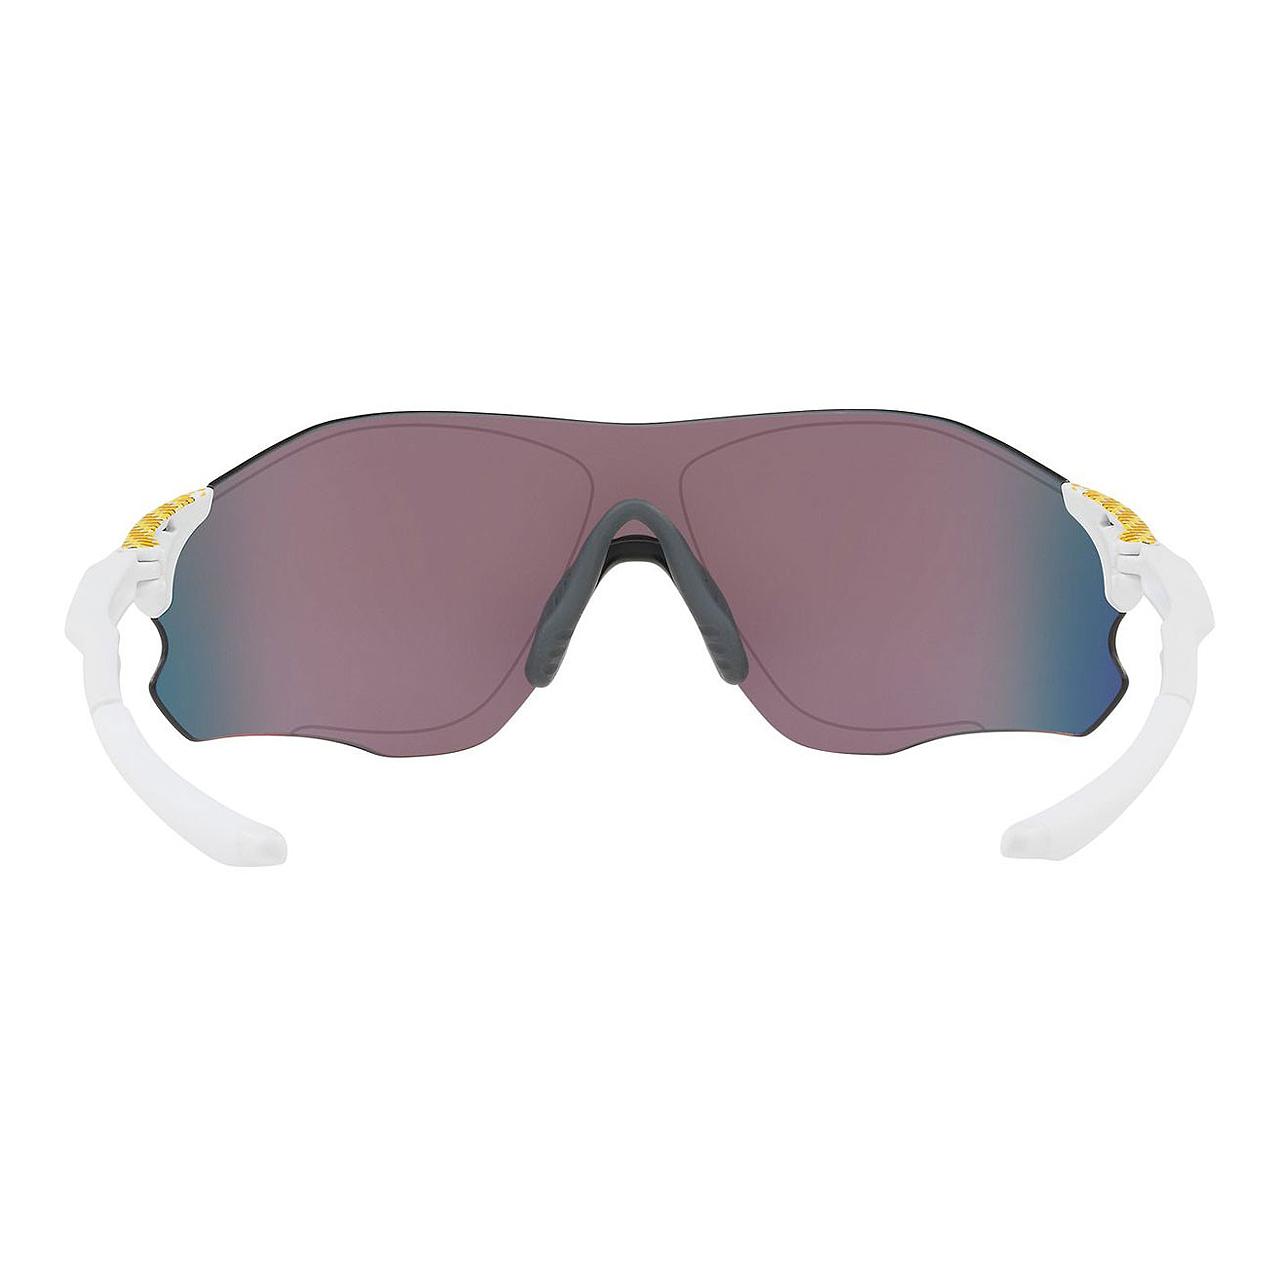 عینک آفتابی اوکلی مدل EVZero Path Tour de France کد OO9308-1938 -  - 5